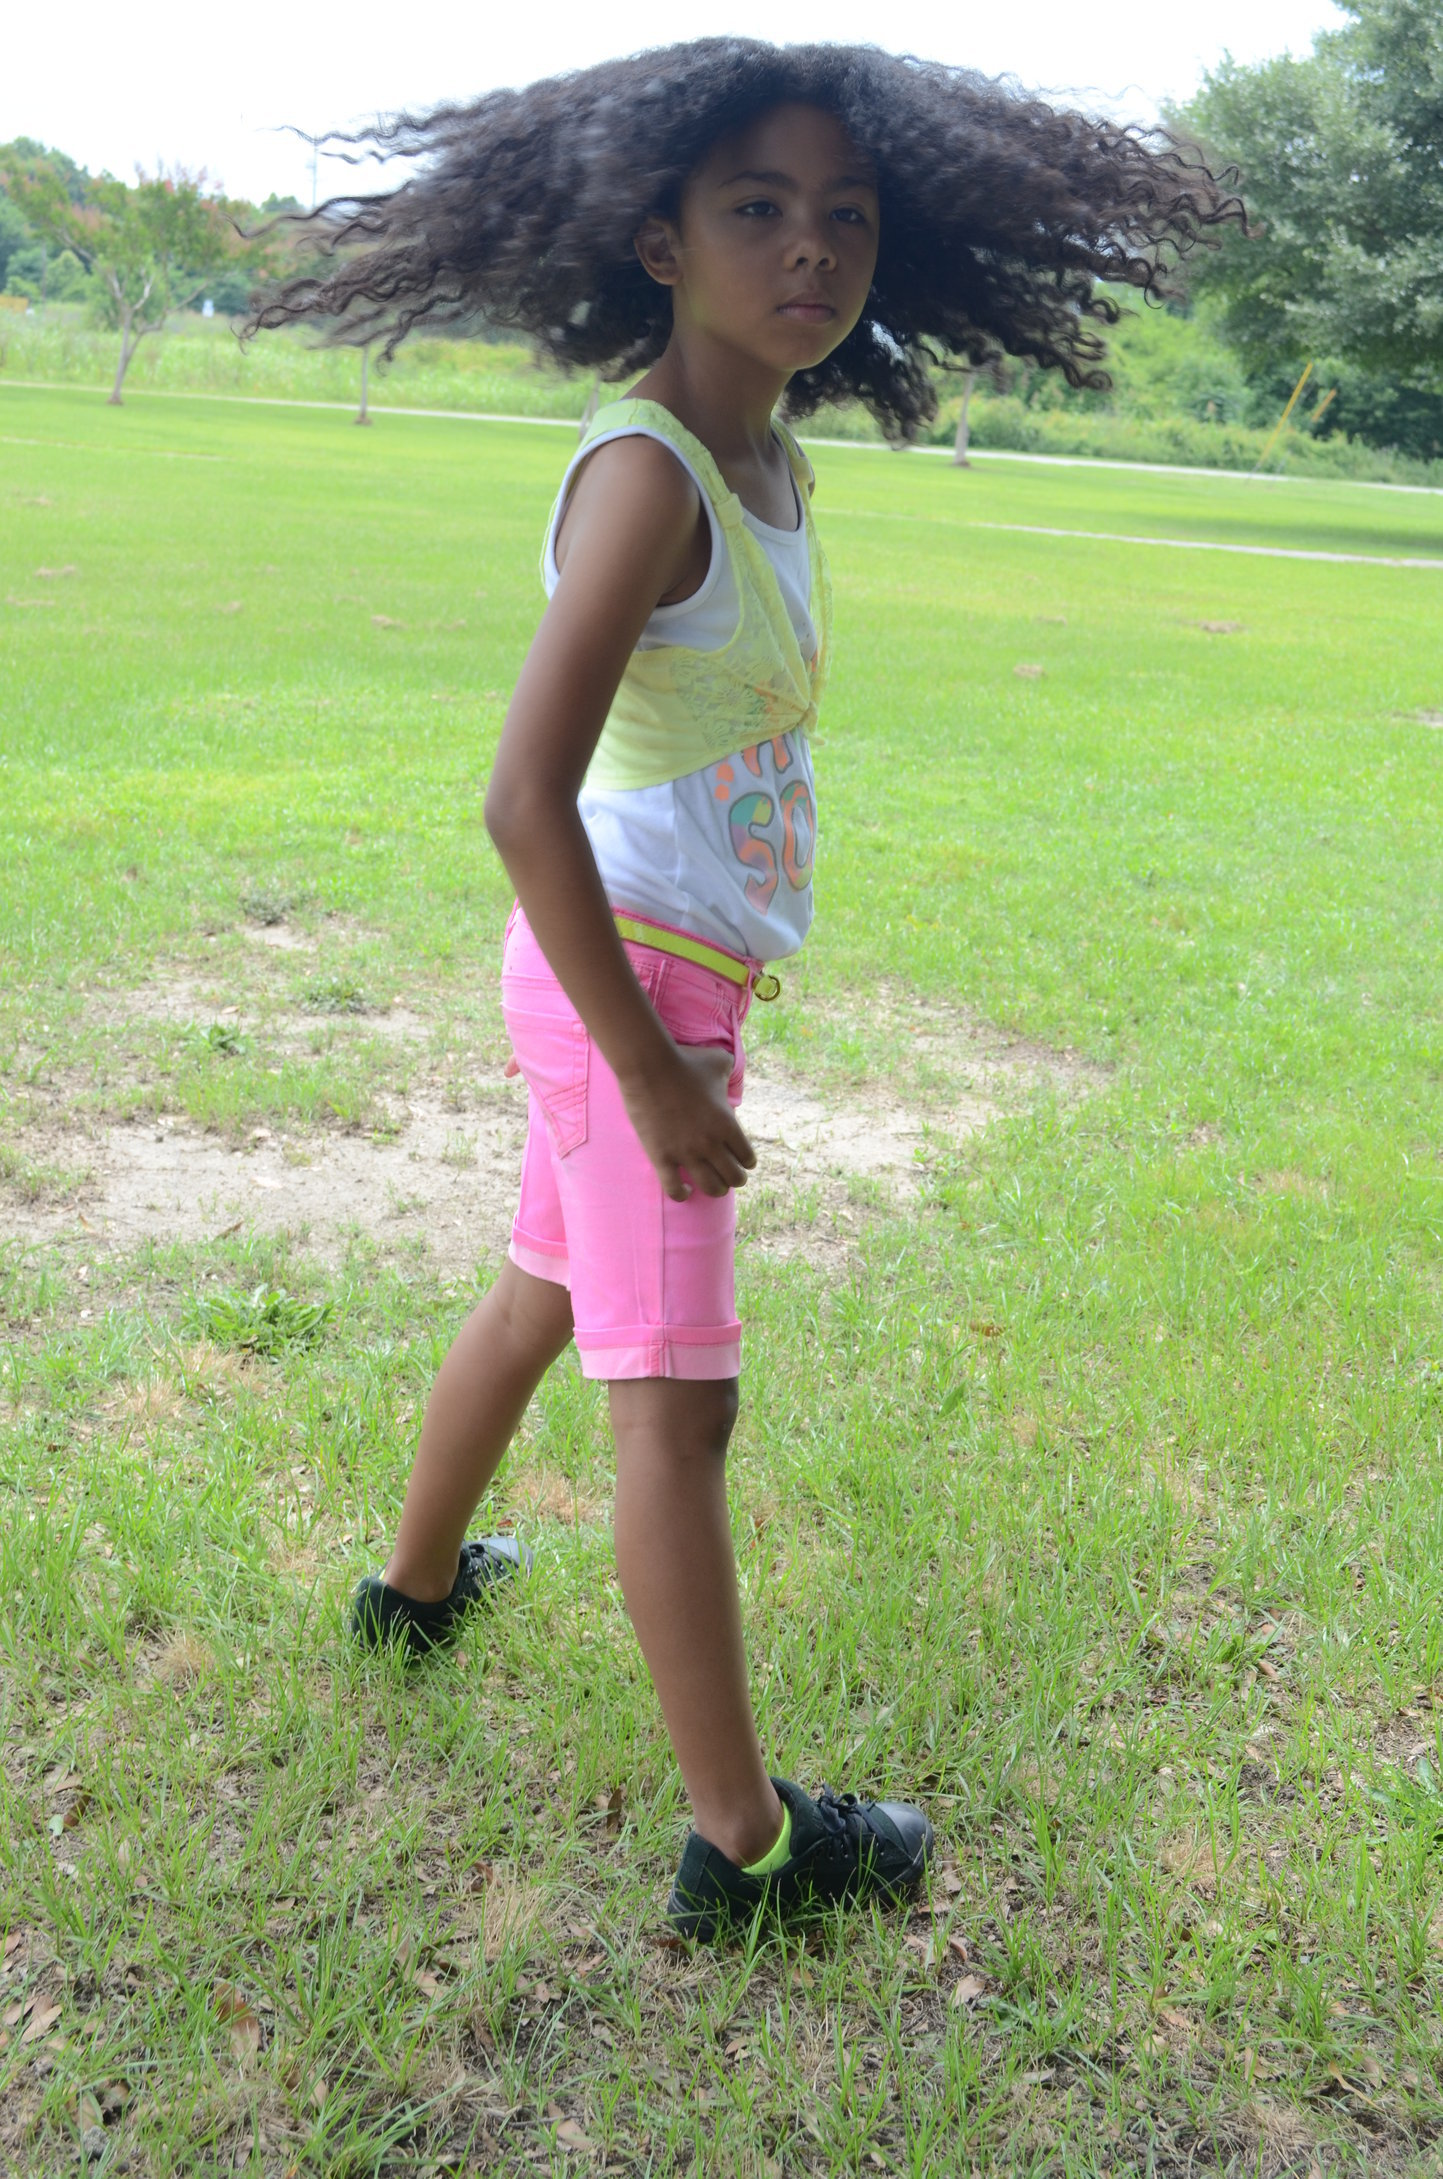 ASHAH HALL- Prima ballerina child star and model.